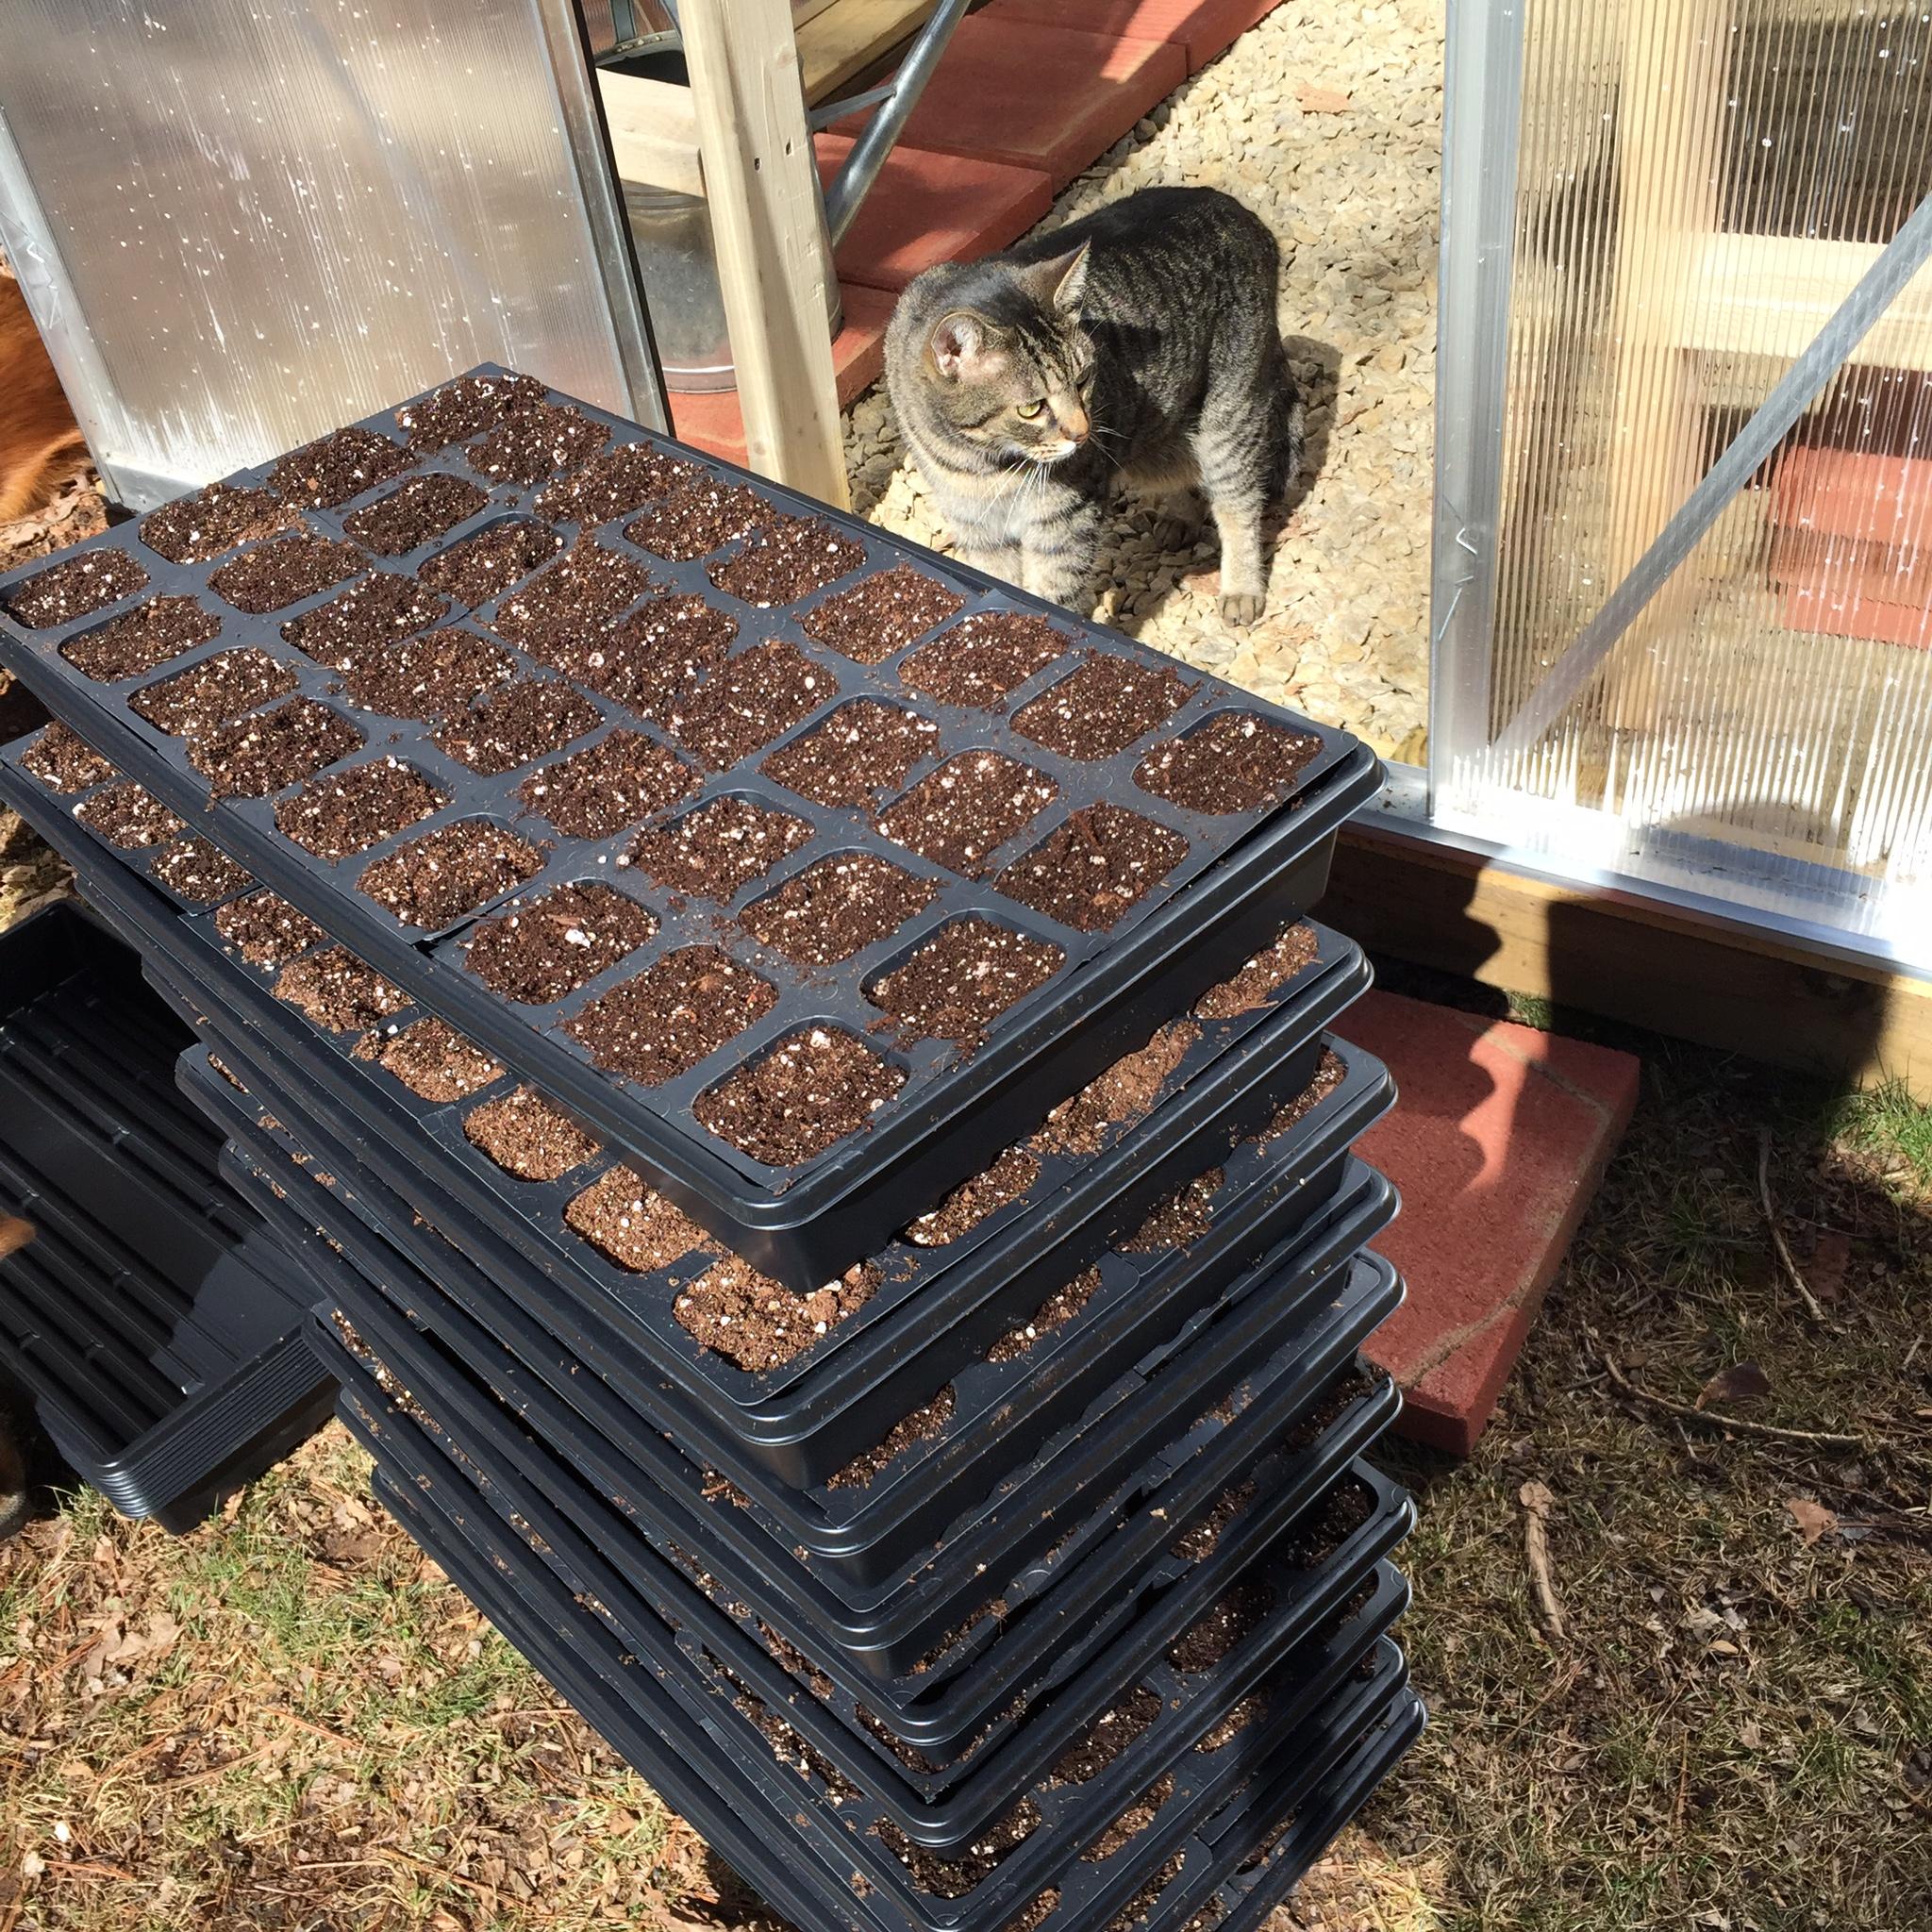 Norman the cat: greenhouse overseer